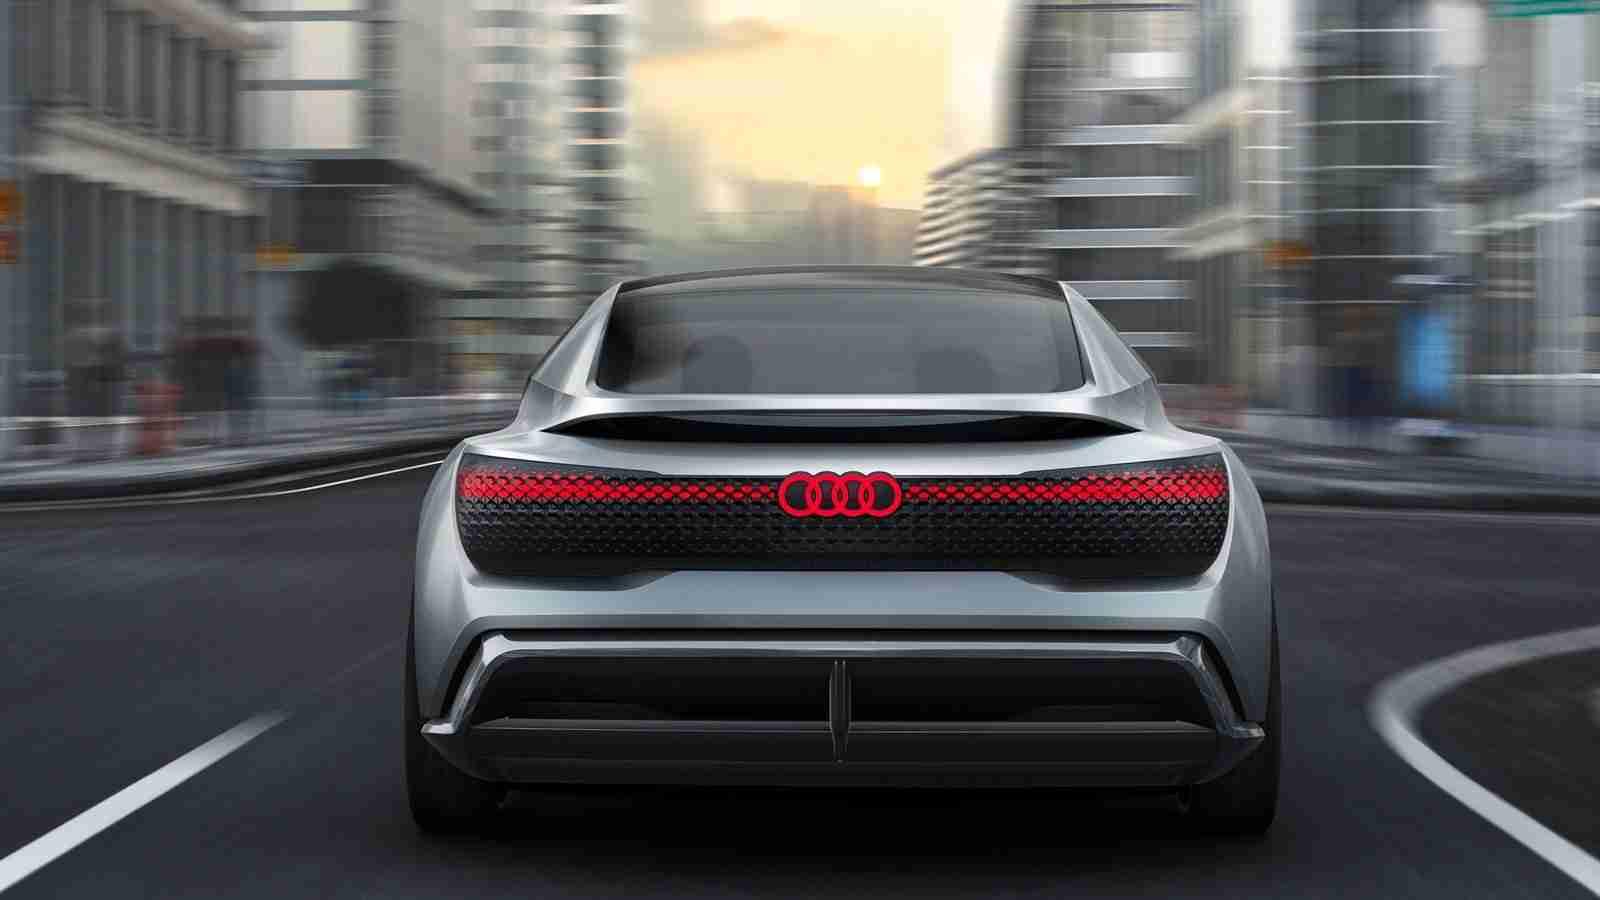 Audi, Volkswagen Customer Data Being Sold on a Hacking Forum